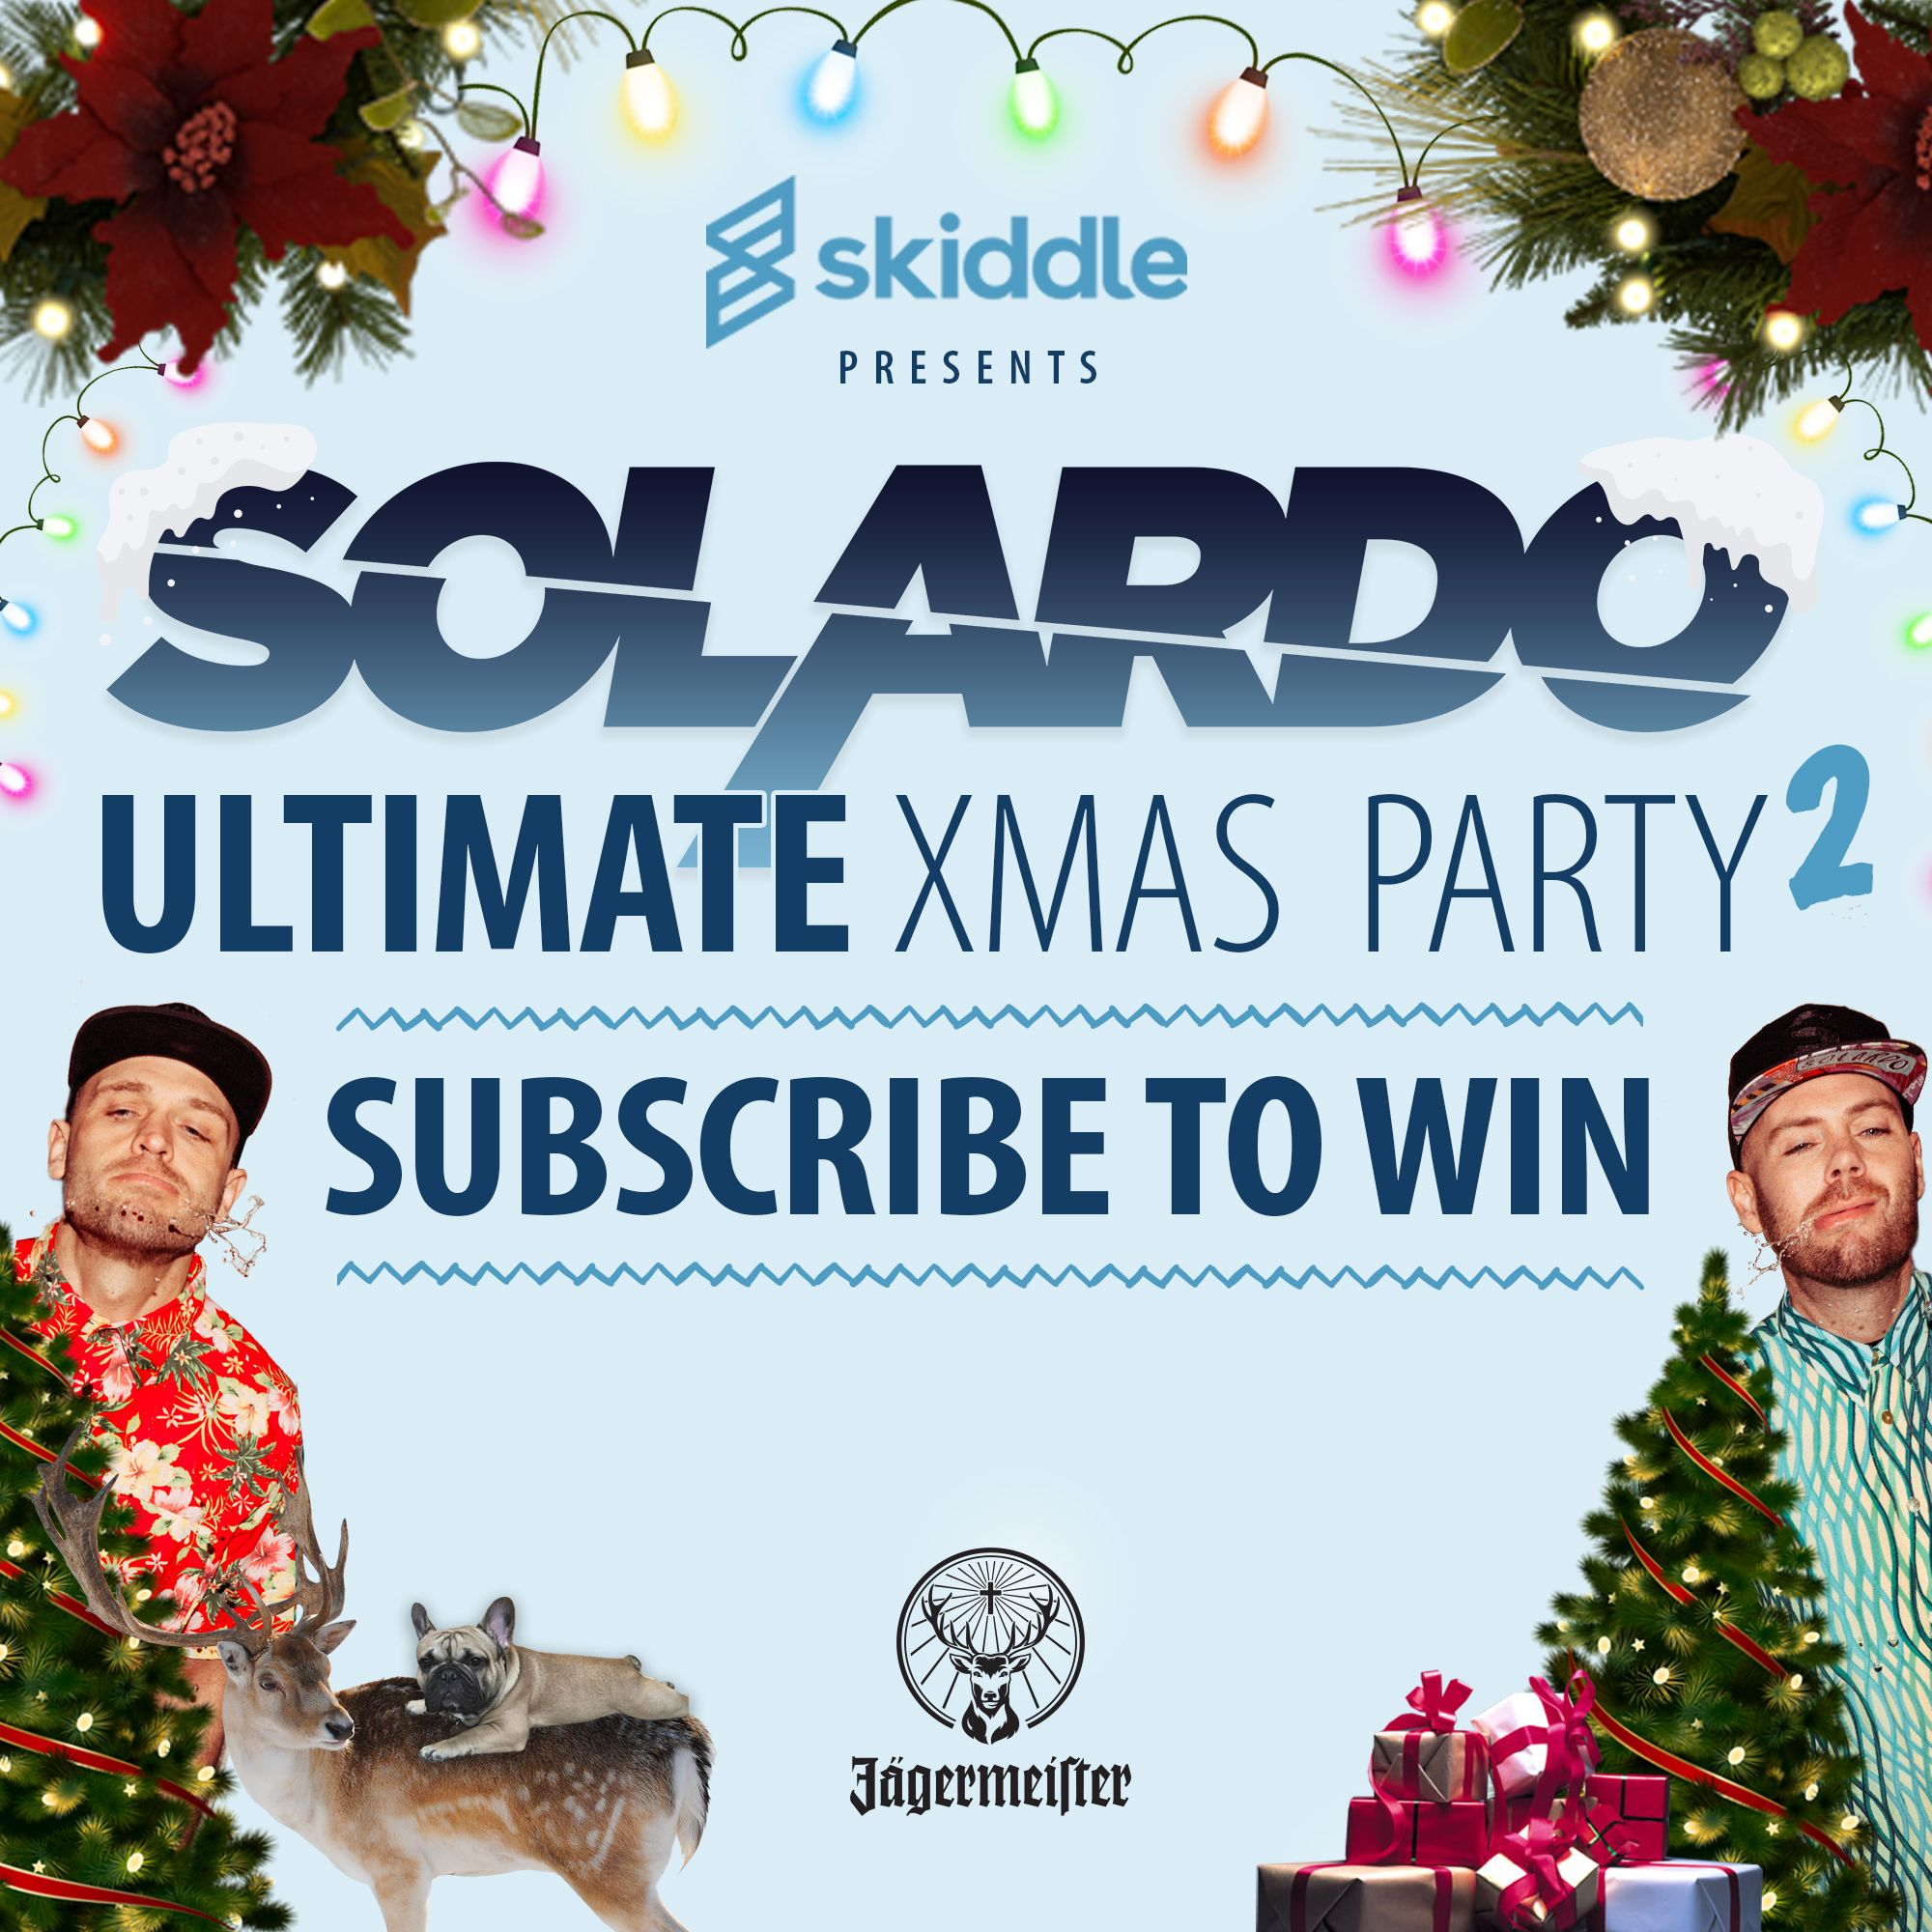 Uk Duo Solardo Announce Special Christmas Competition Hugely Popular Mancunian Pair Solardo James Eliot Christmas Competitions Christmas Special Xmas Party